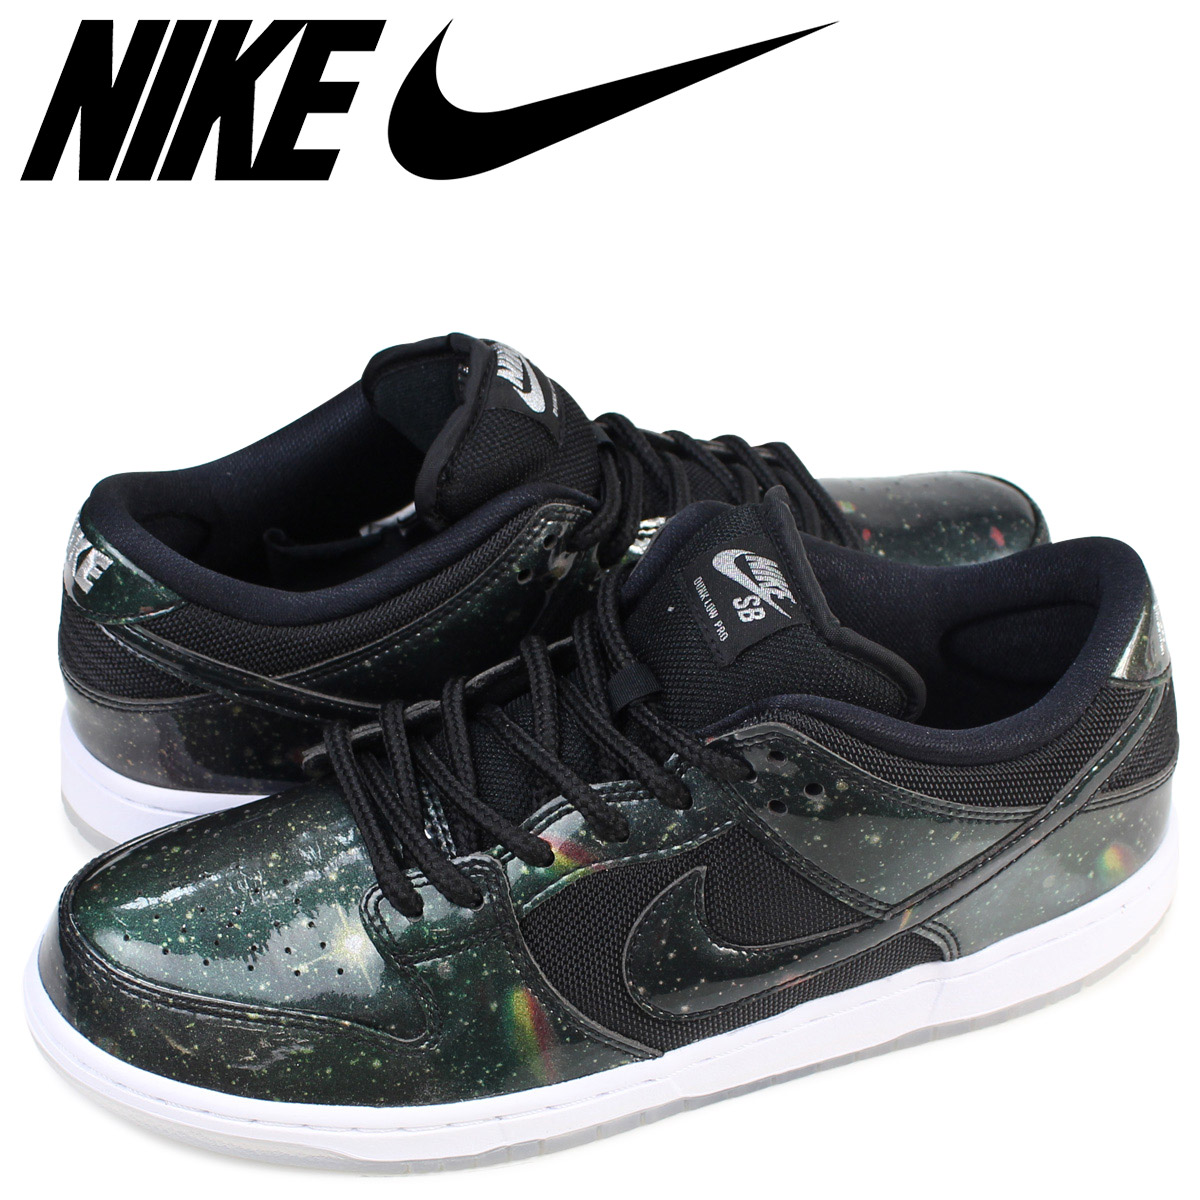 sports shoes dc931 21fd5 ALLSPORTS  NIKE Nike dunk SB sneakers DUNK LOW TRD QS GALAXY 883,232 ...